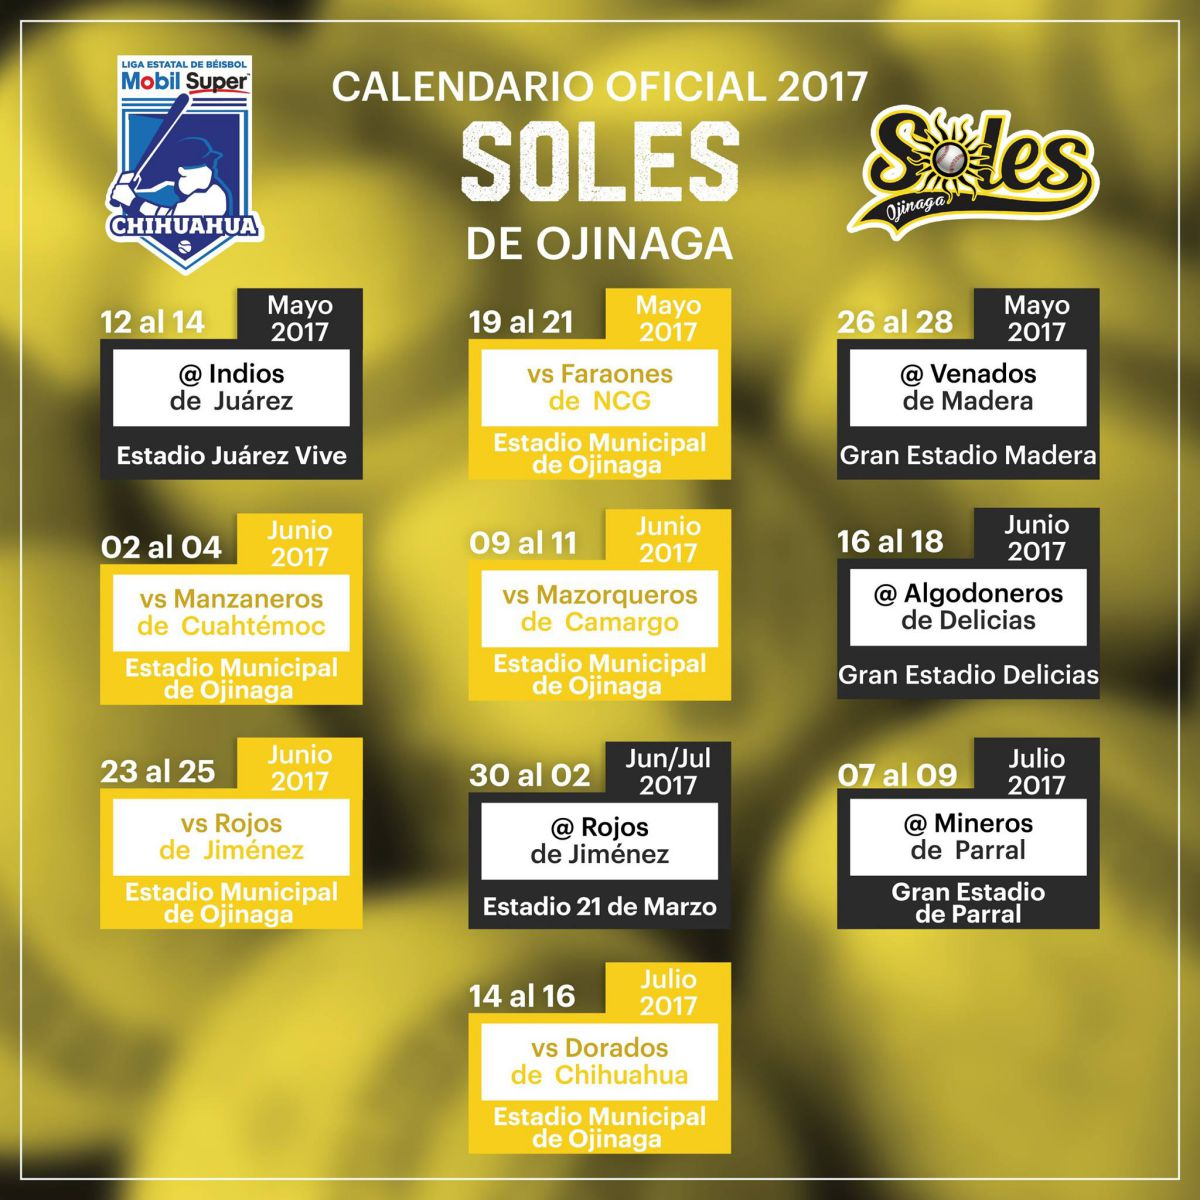 soles calendario beisbol chihuahua 2017